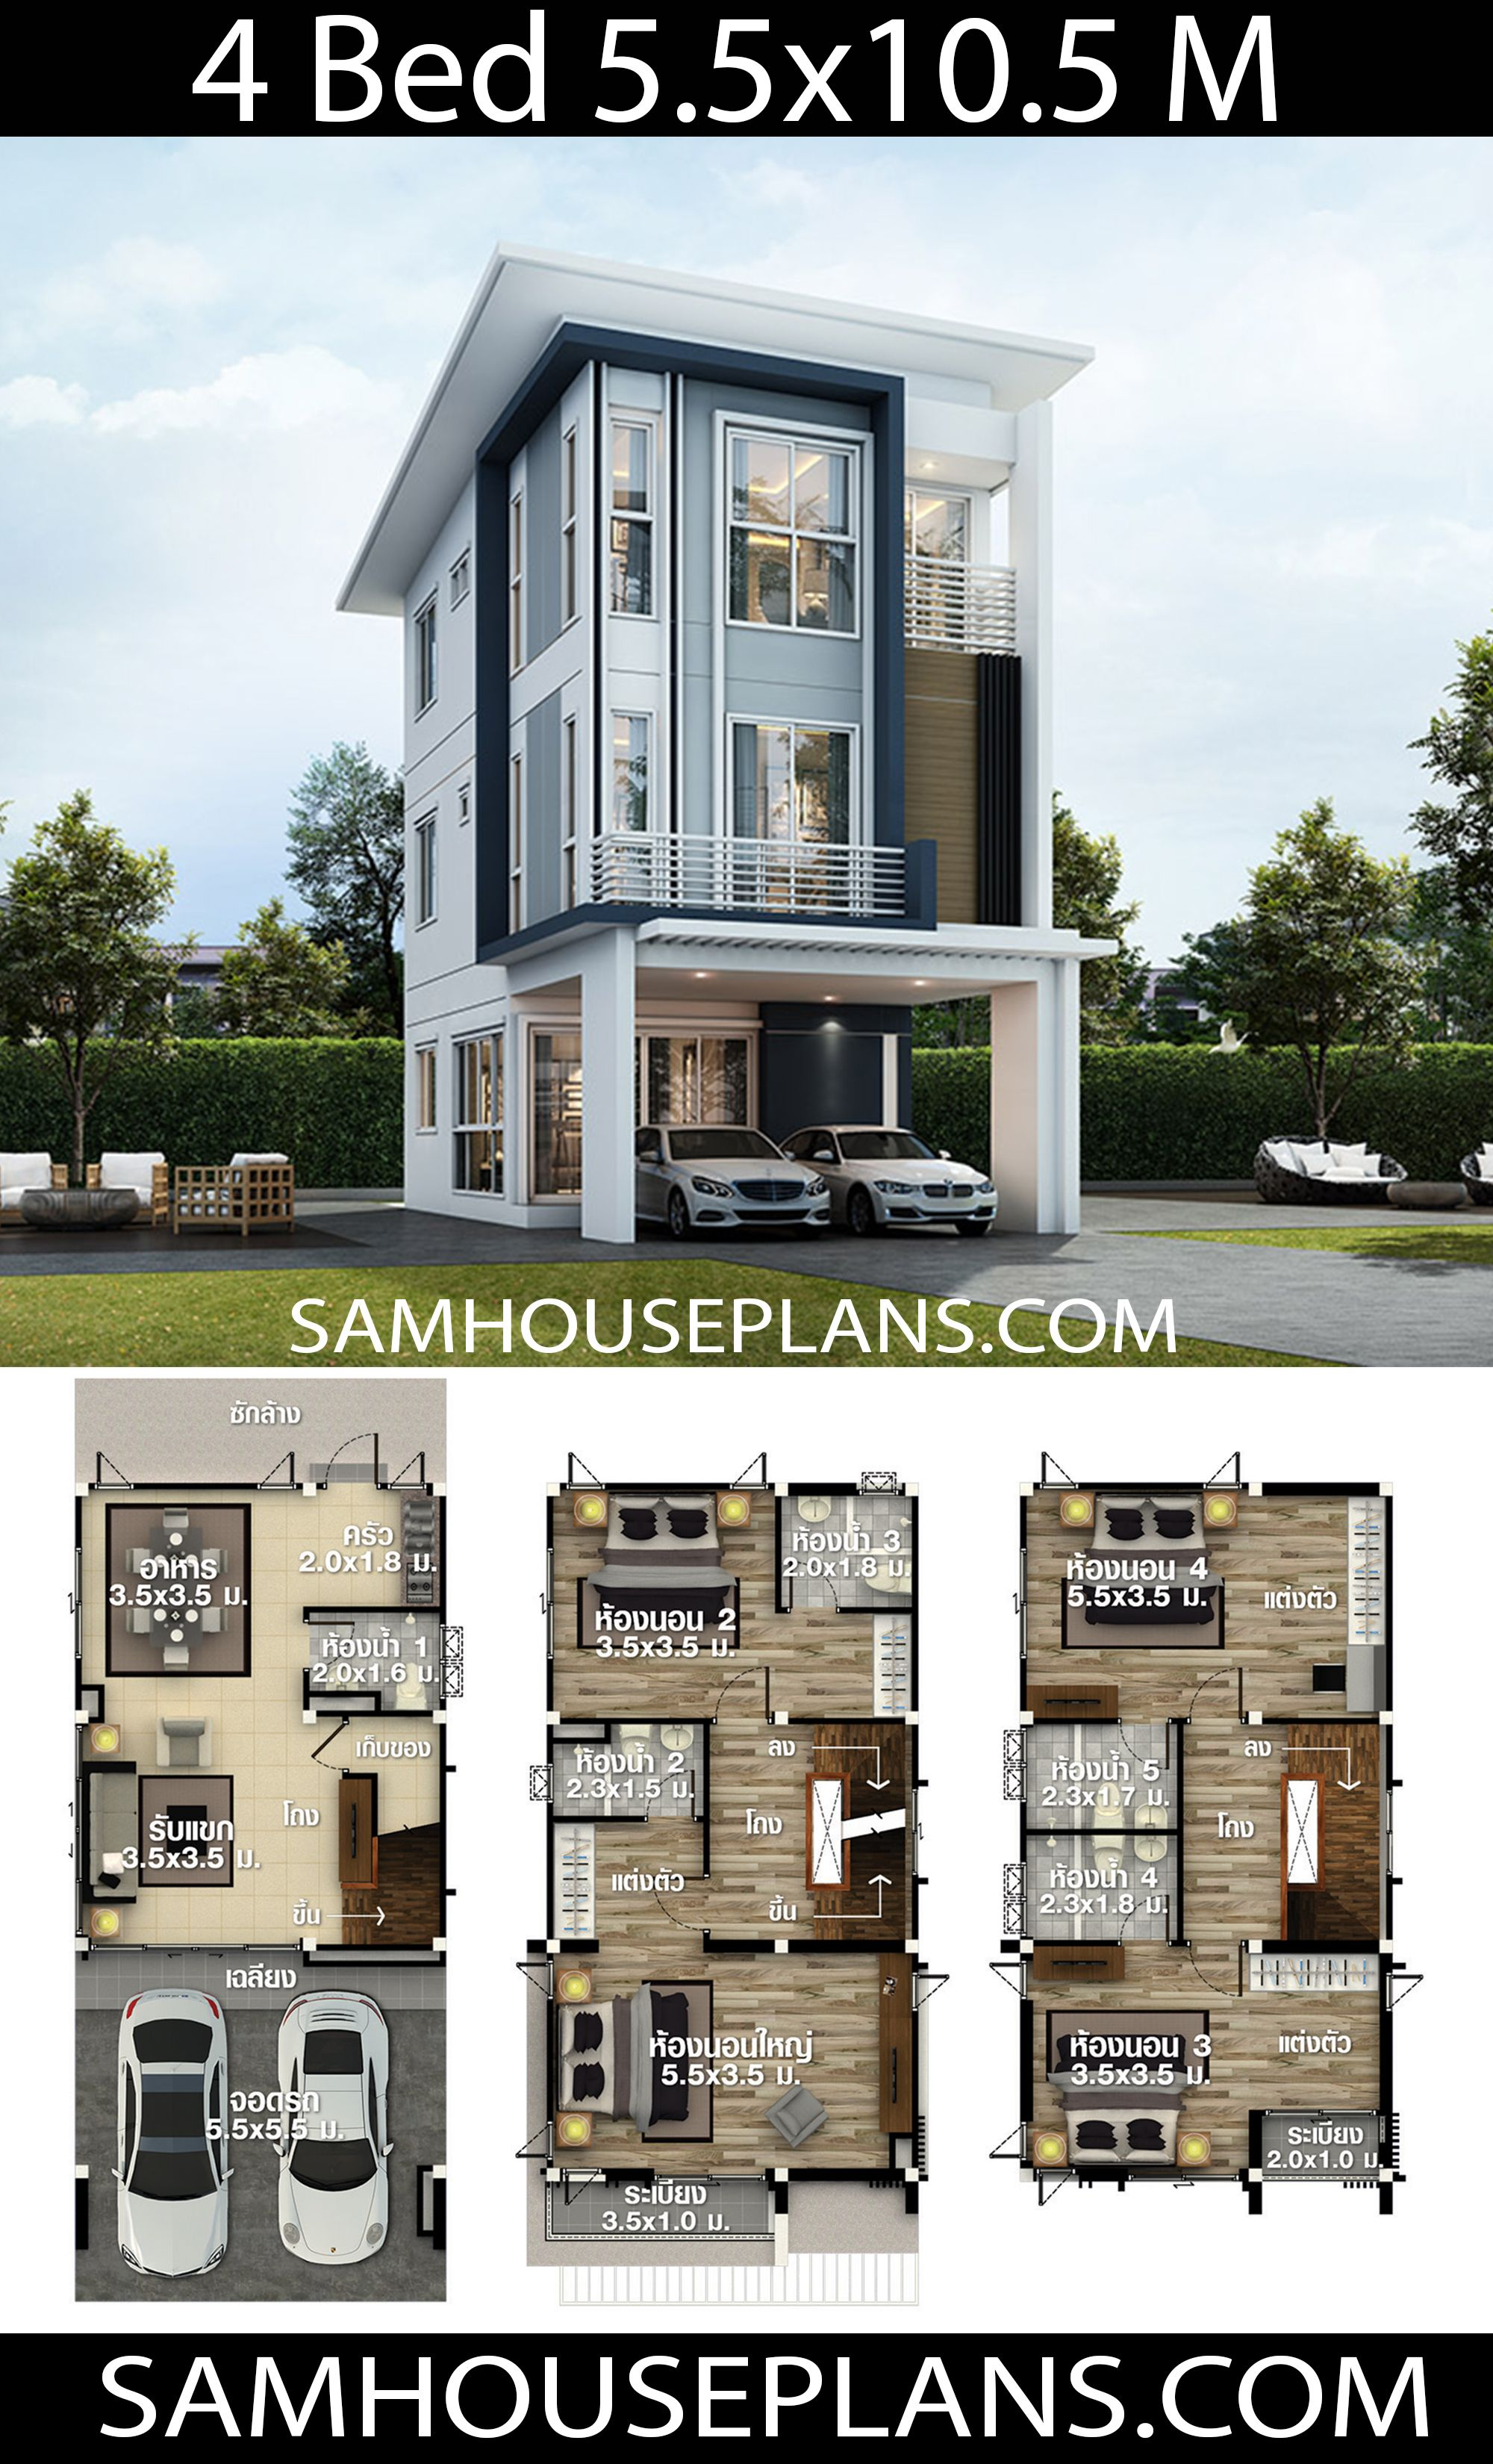 House Plans Idea 5 5x10 5 With 4 Bedrooms Sam House Plans In 2020 Narrow House Plans Contemporary House Plans Duplex House Design